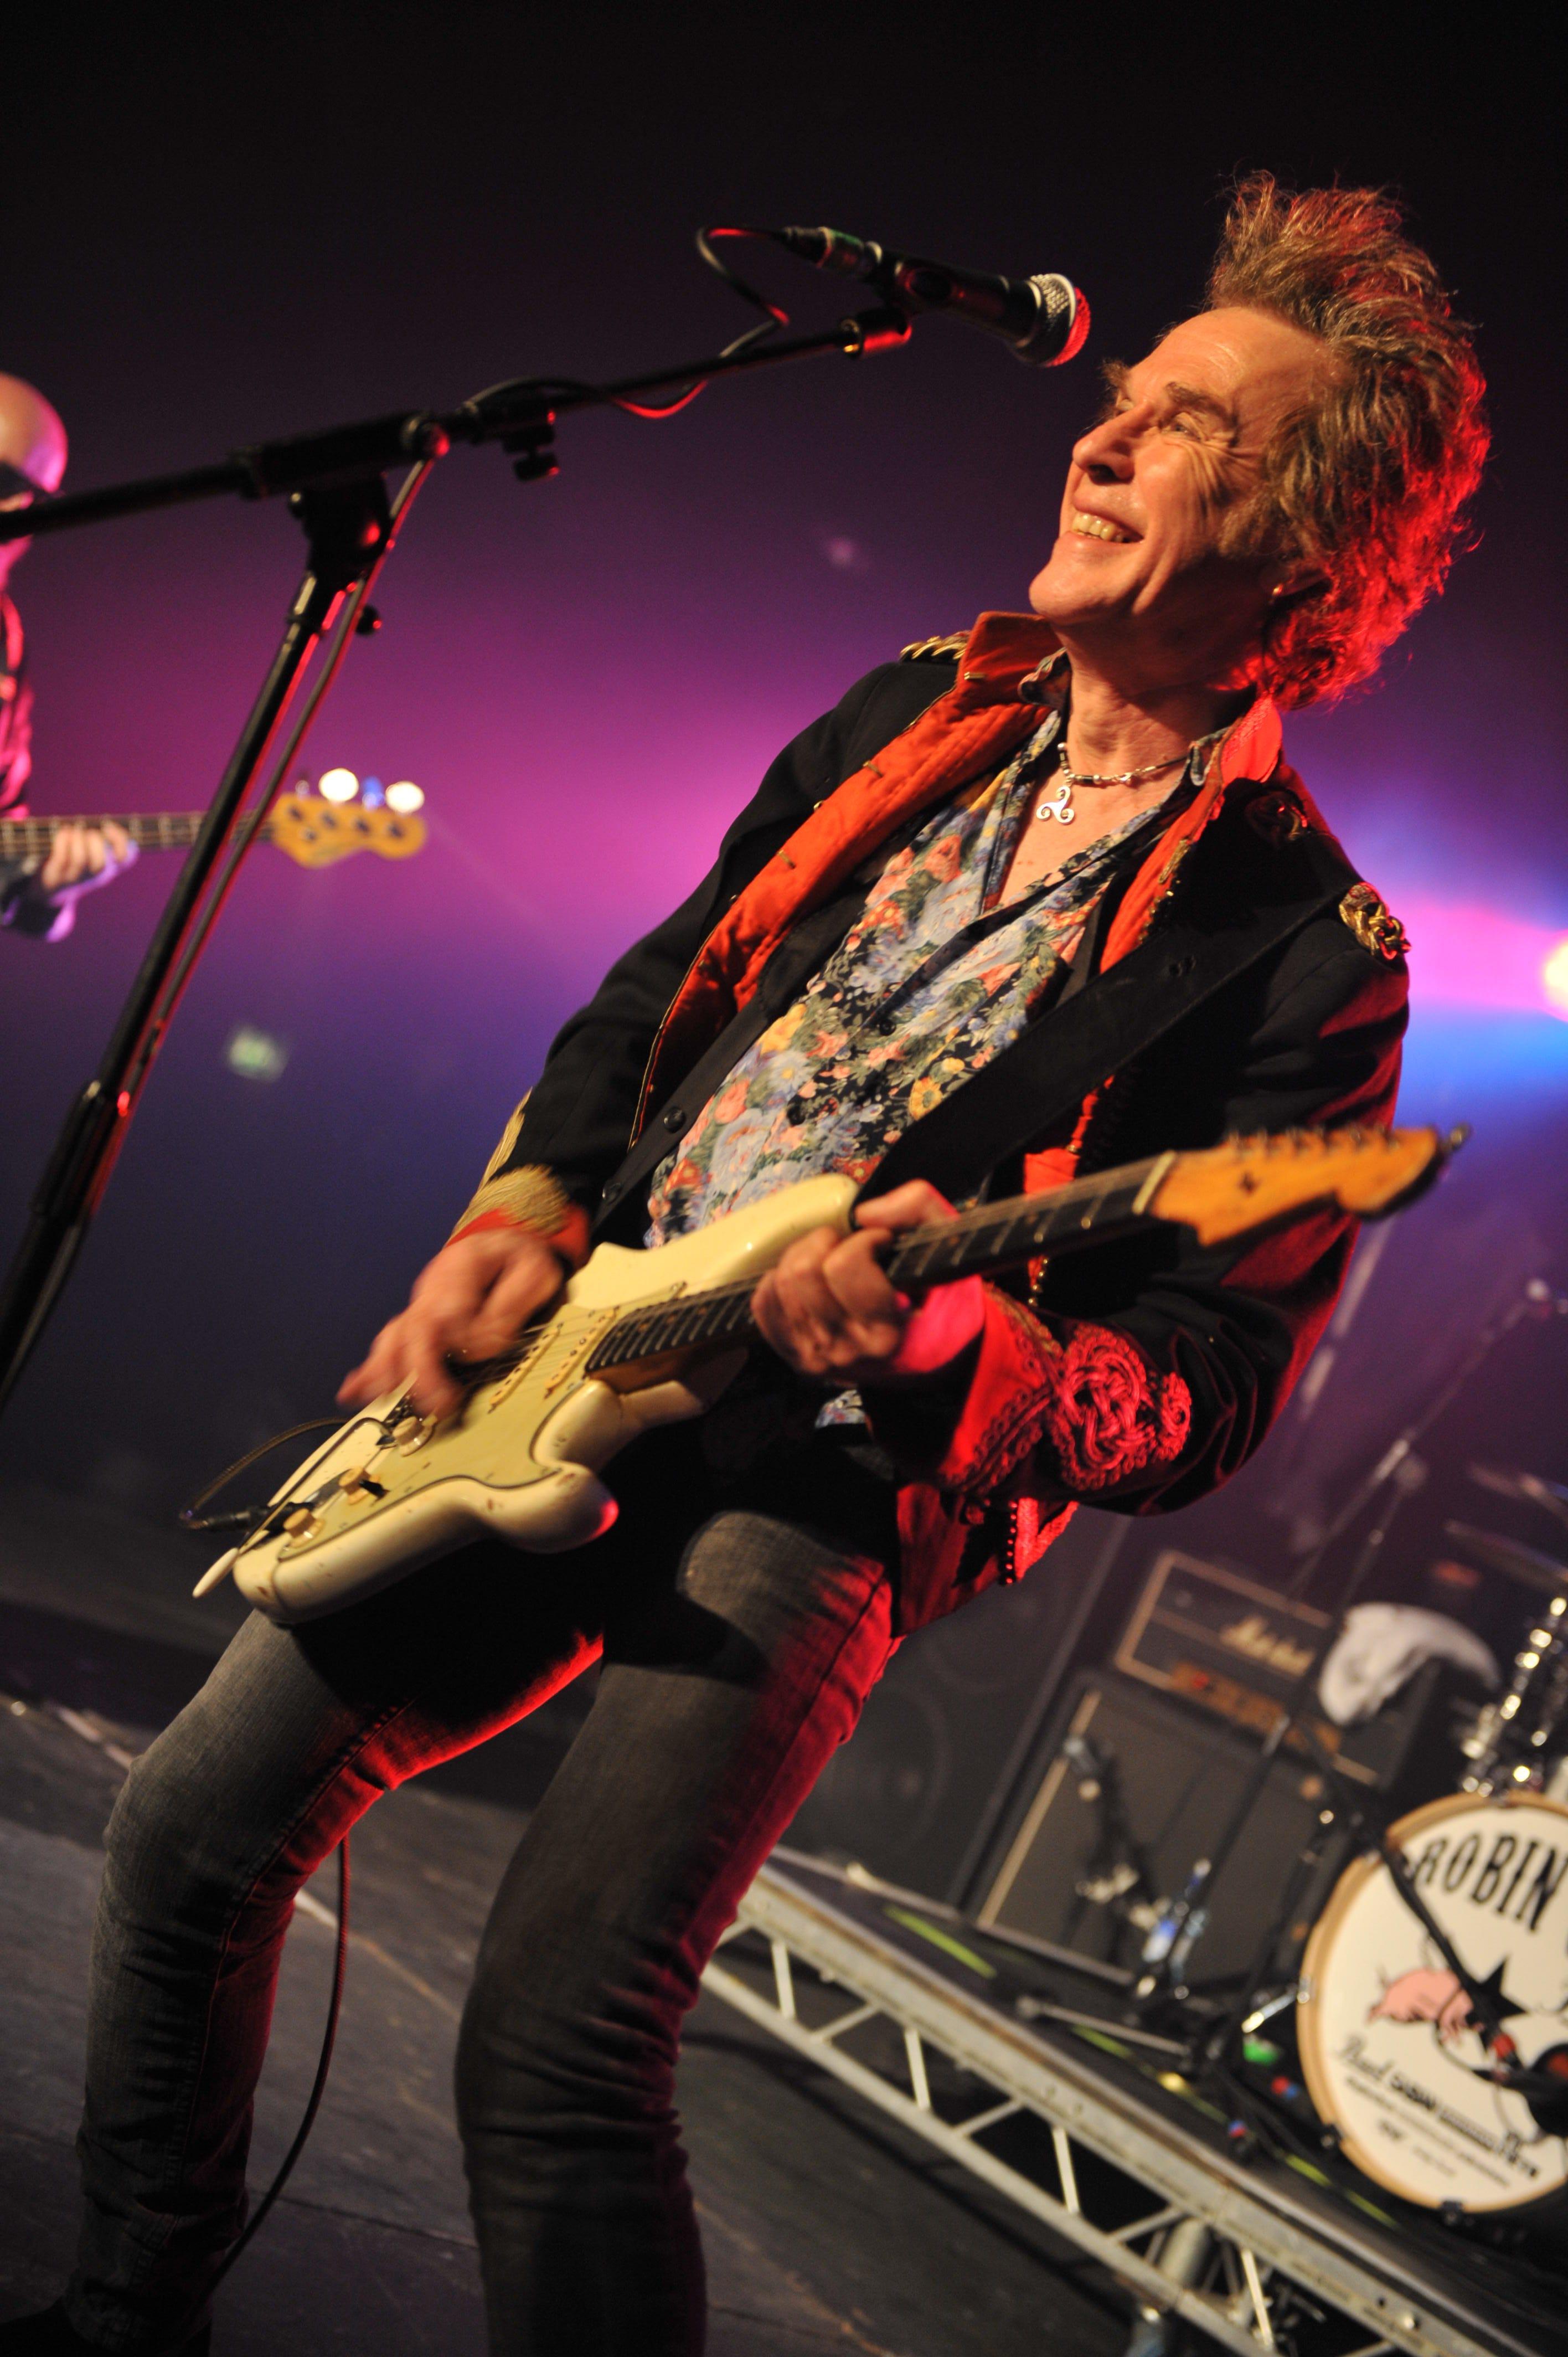 Bernie Torme, former Ozzy Osbourne guitarist, dead at 66